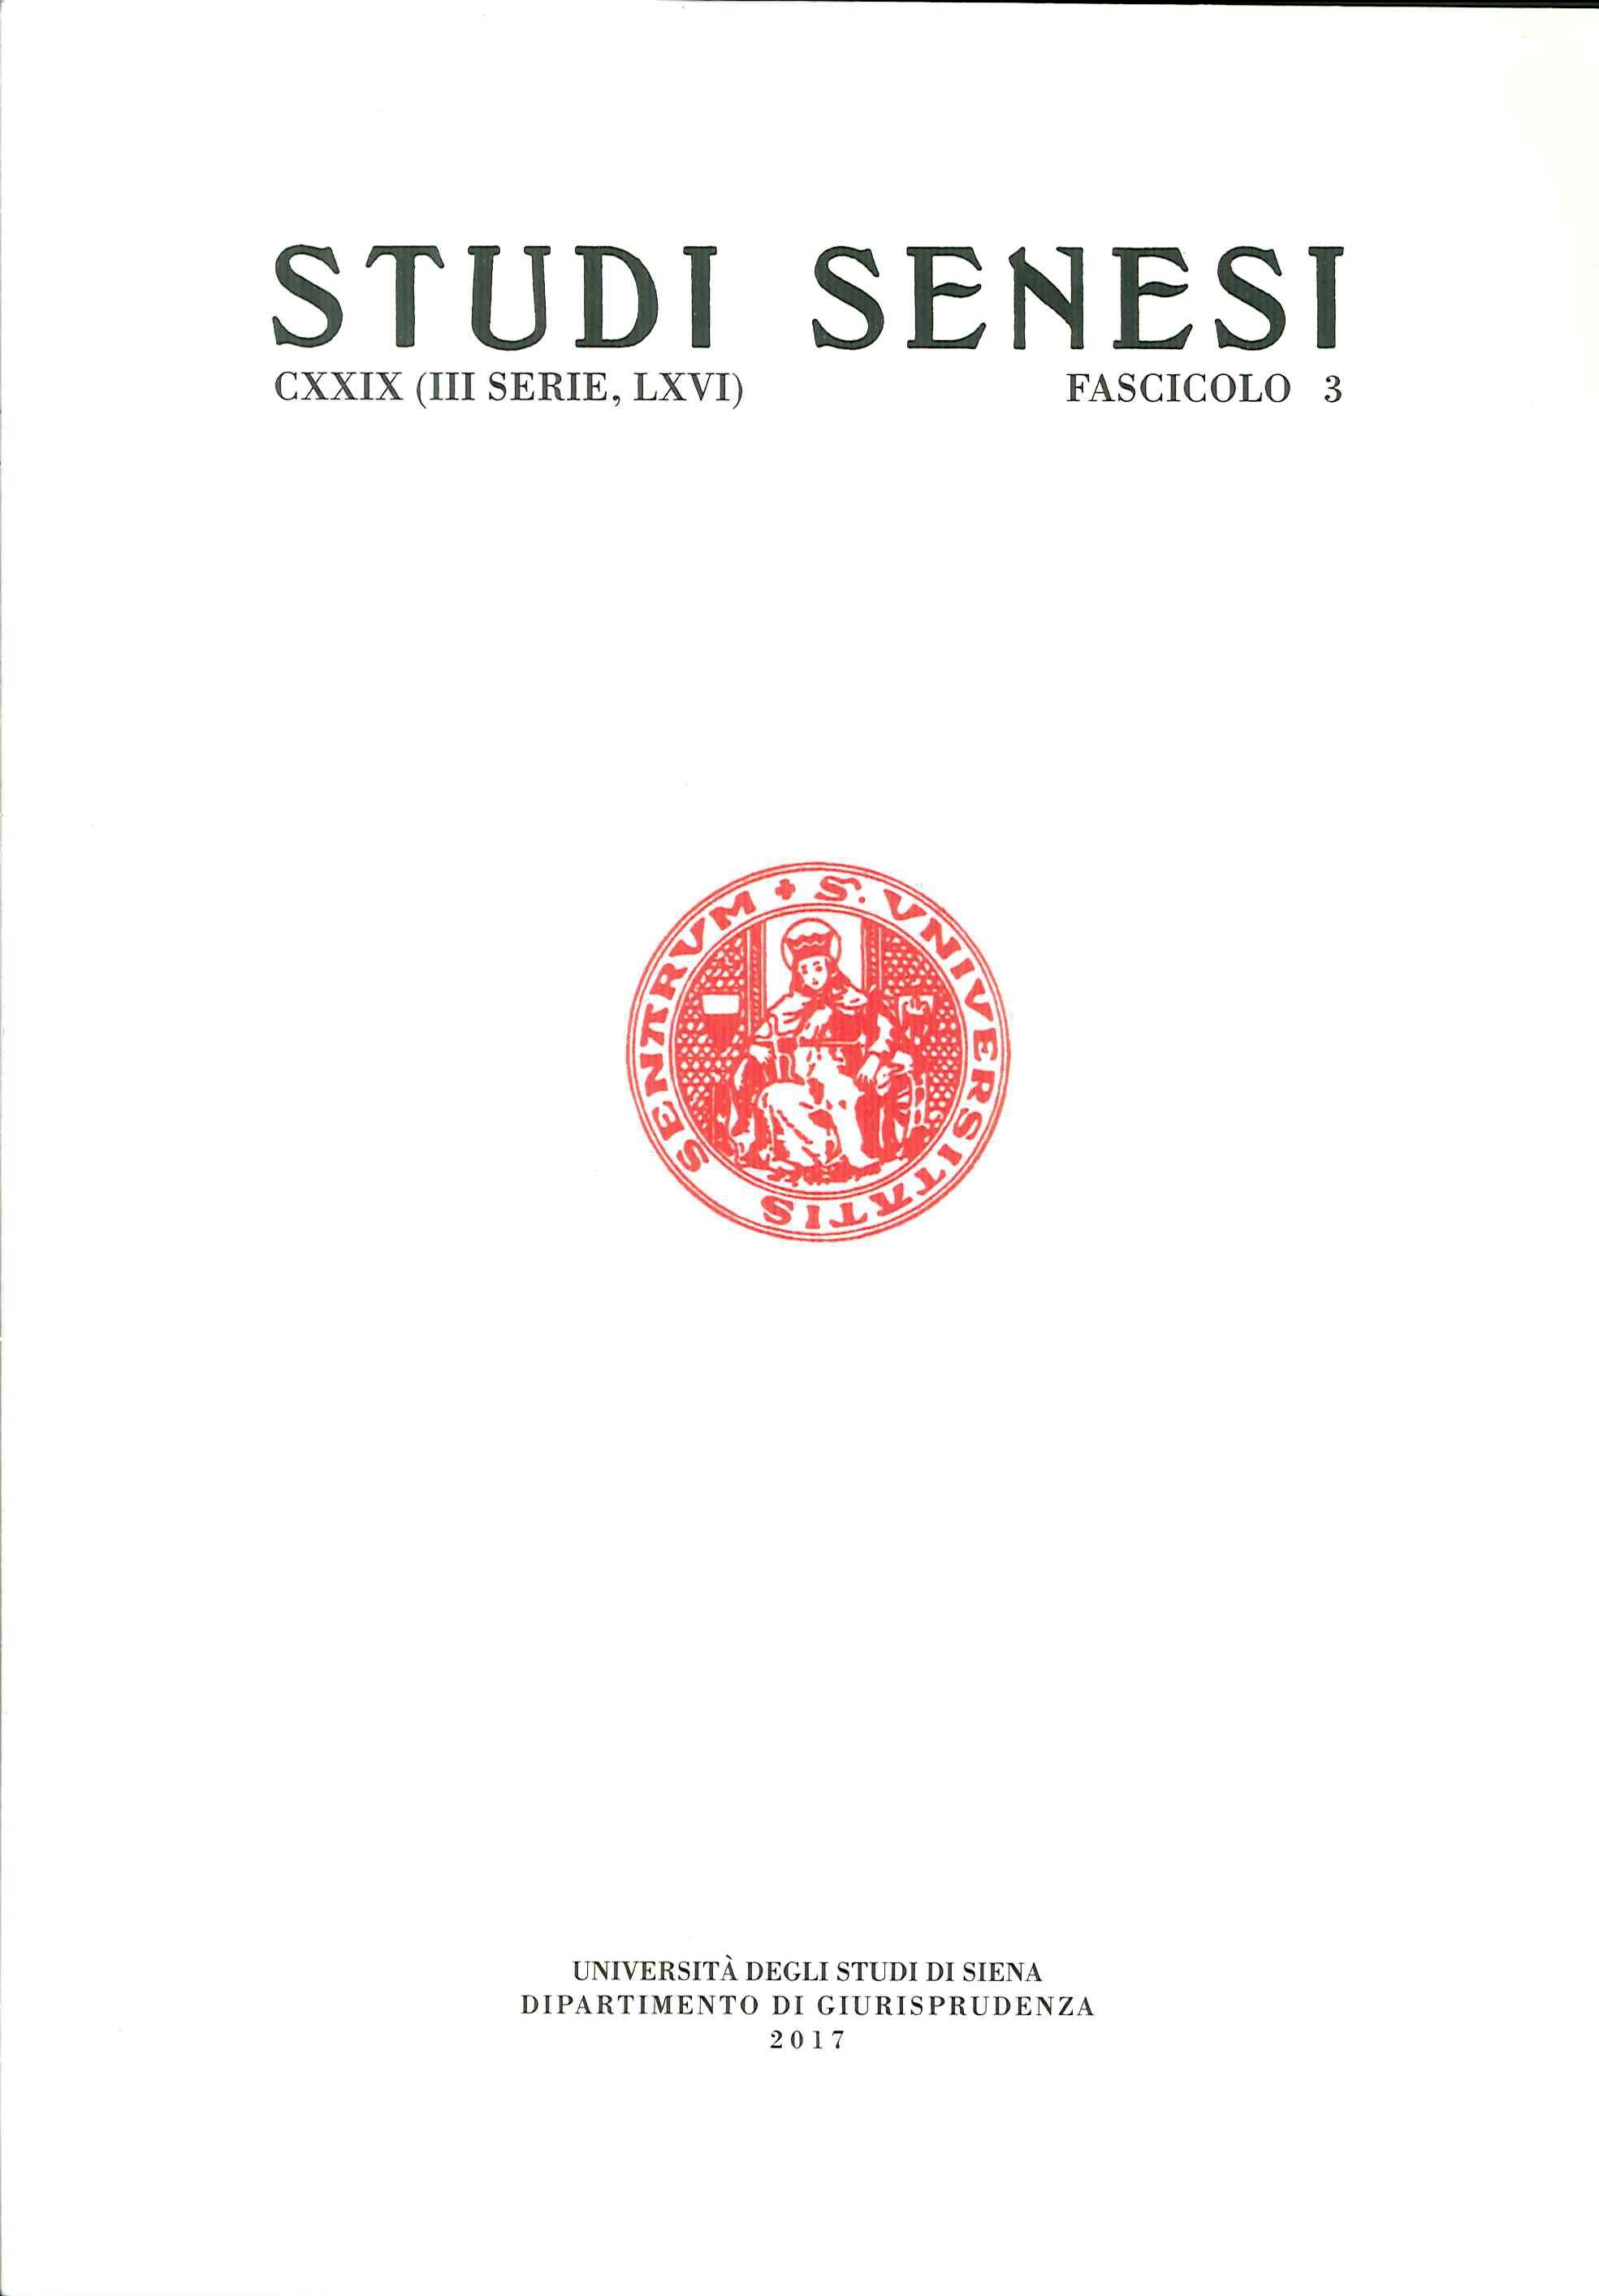 Studi Senesi. CXXIV. (III Serie)). LXVI. Fascicolo 3